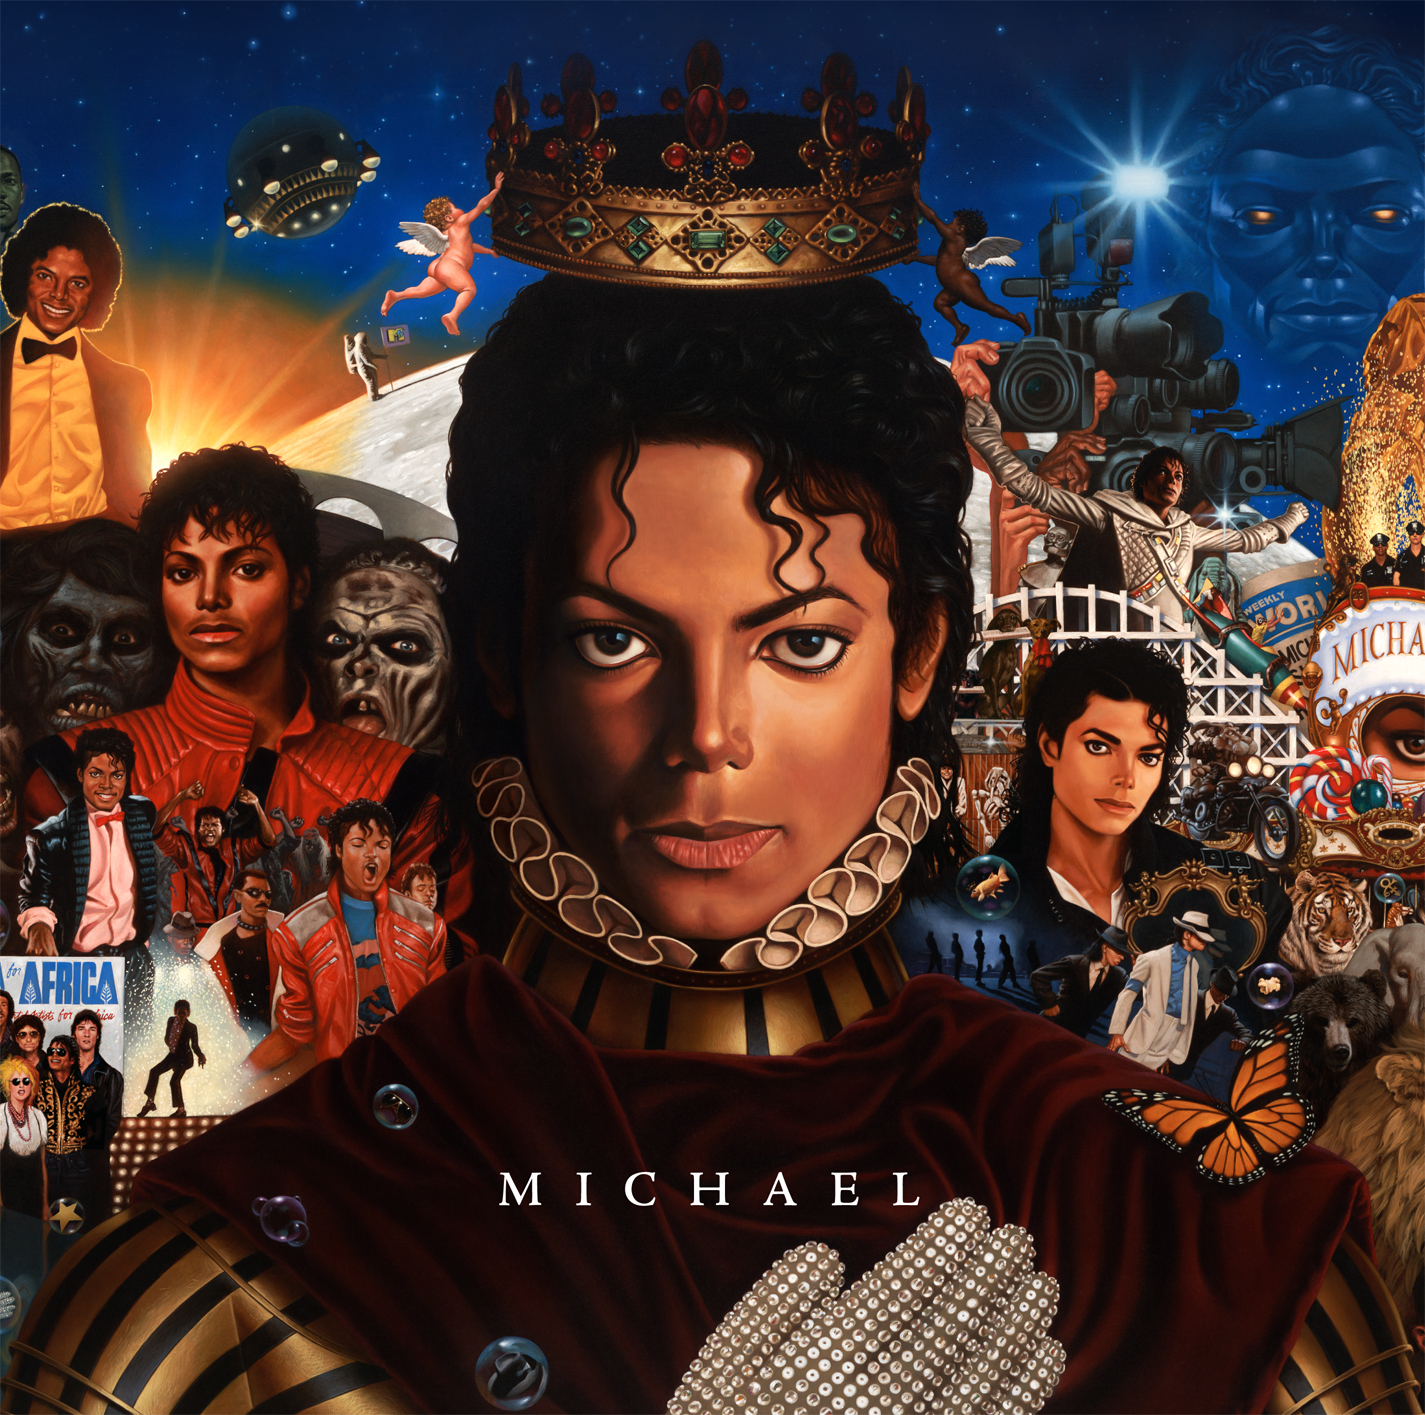 WHAAAT?!?! Sony confiesa haber lanzado música falsa de Michael Jackson